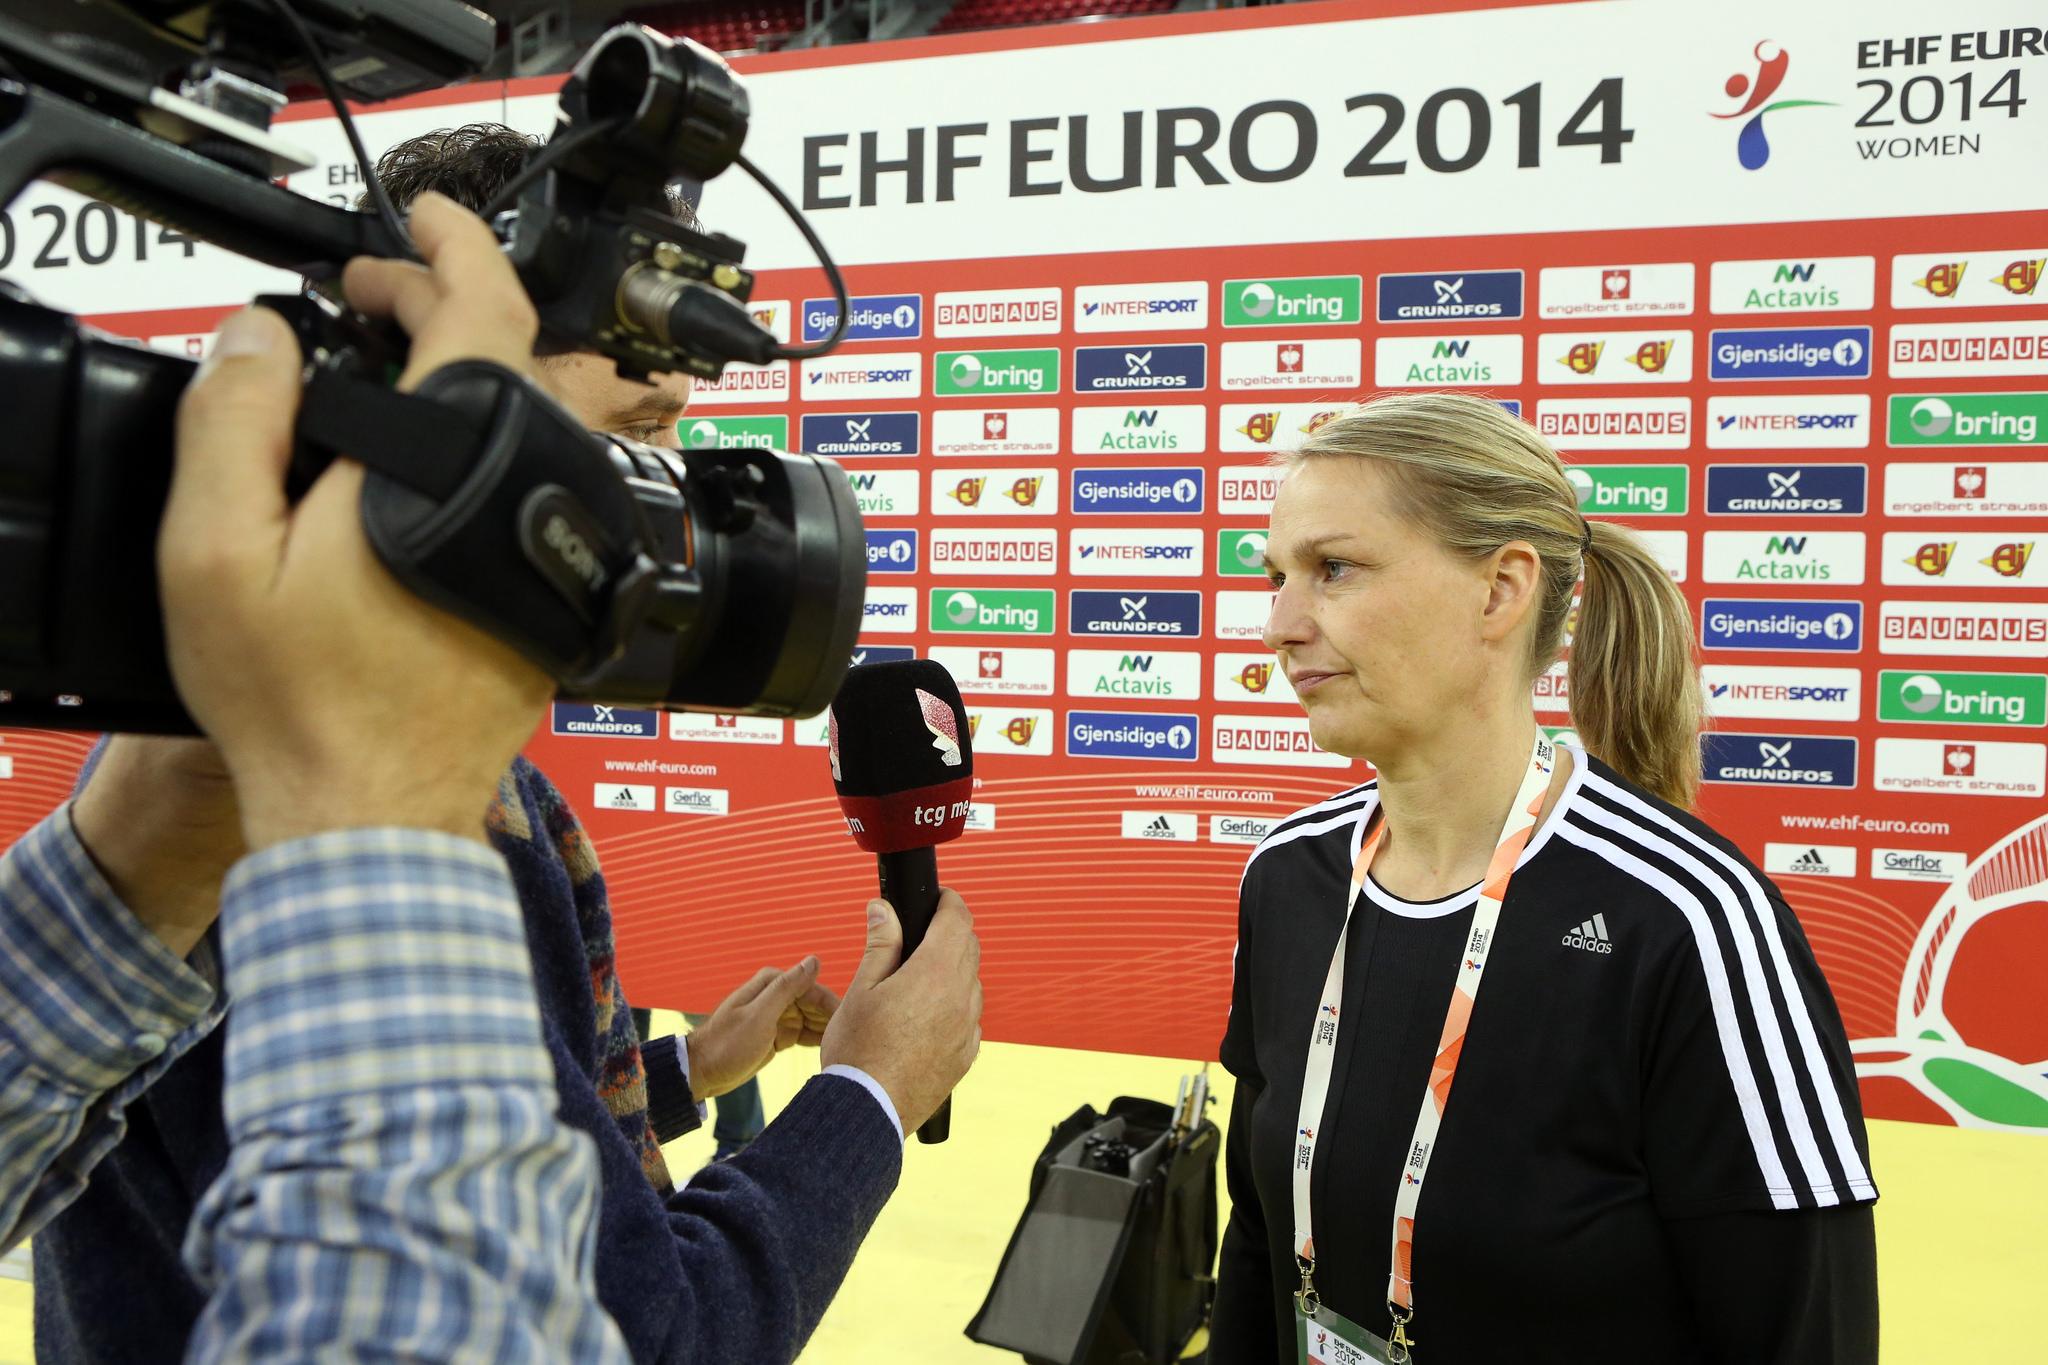 CAPTION: EHF